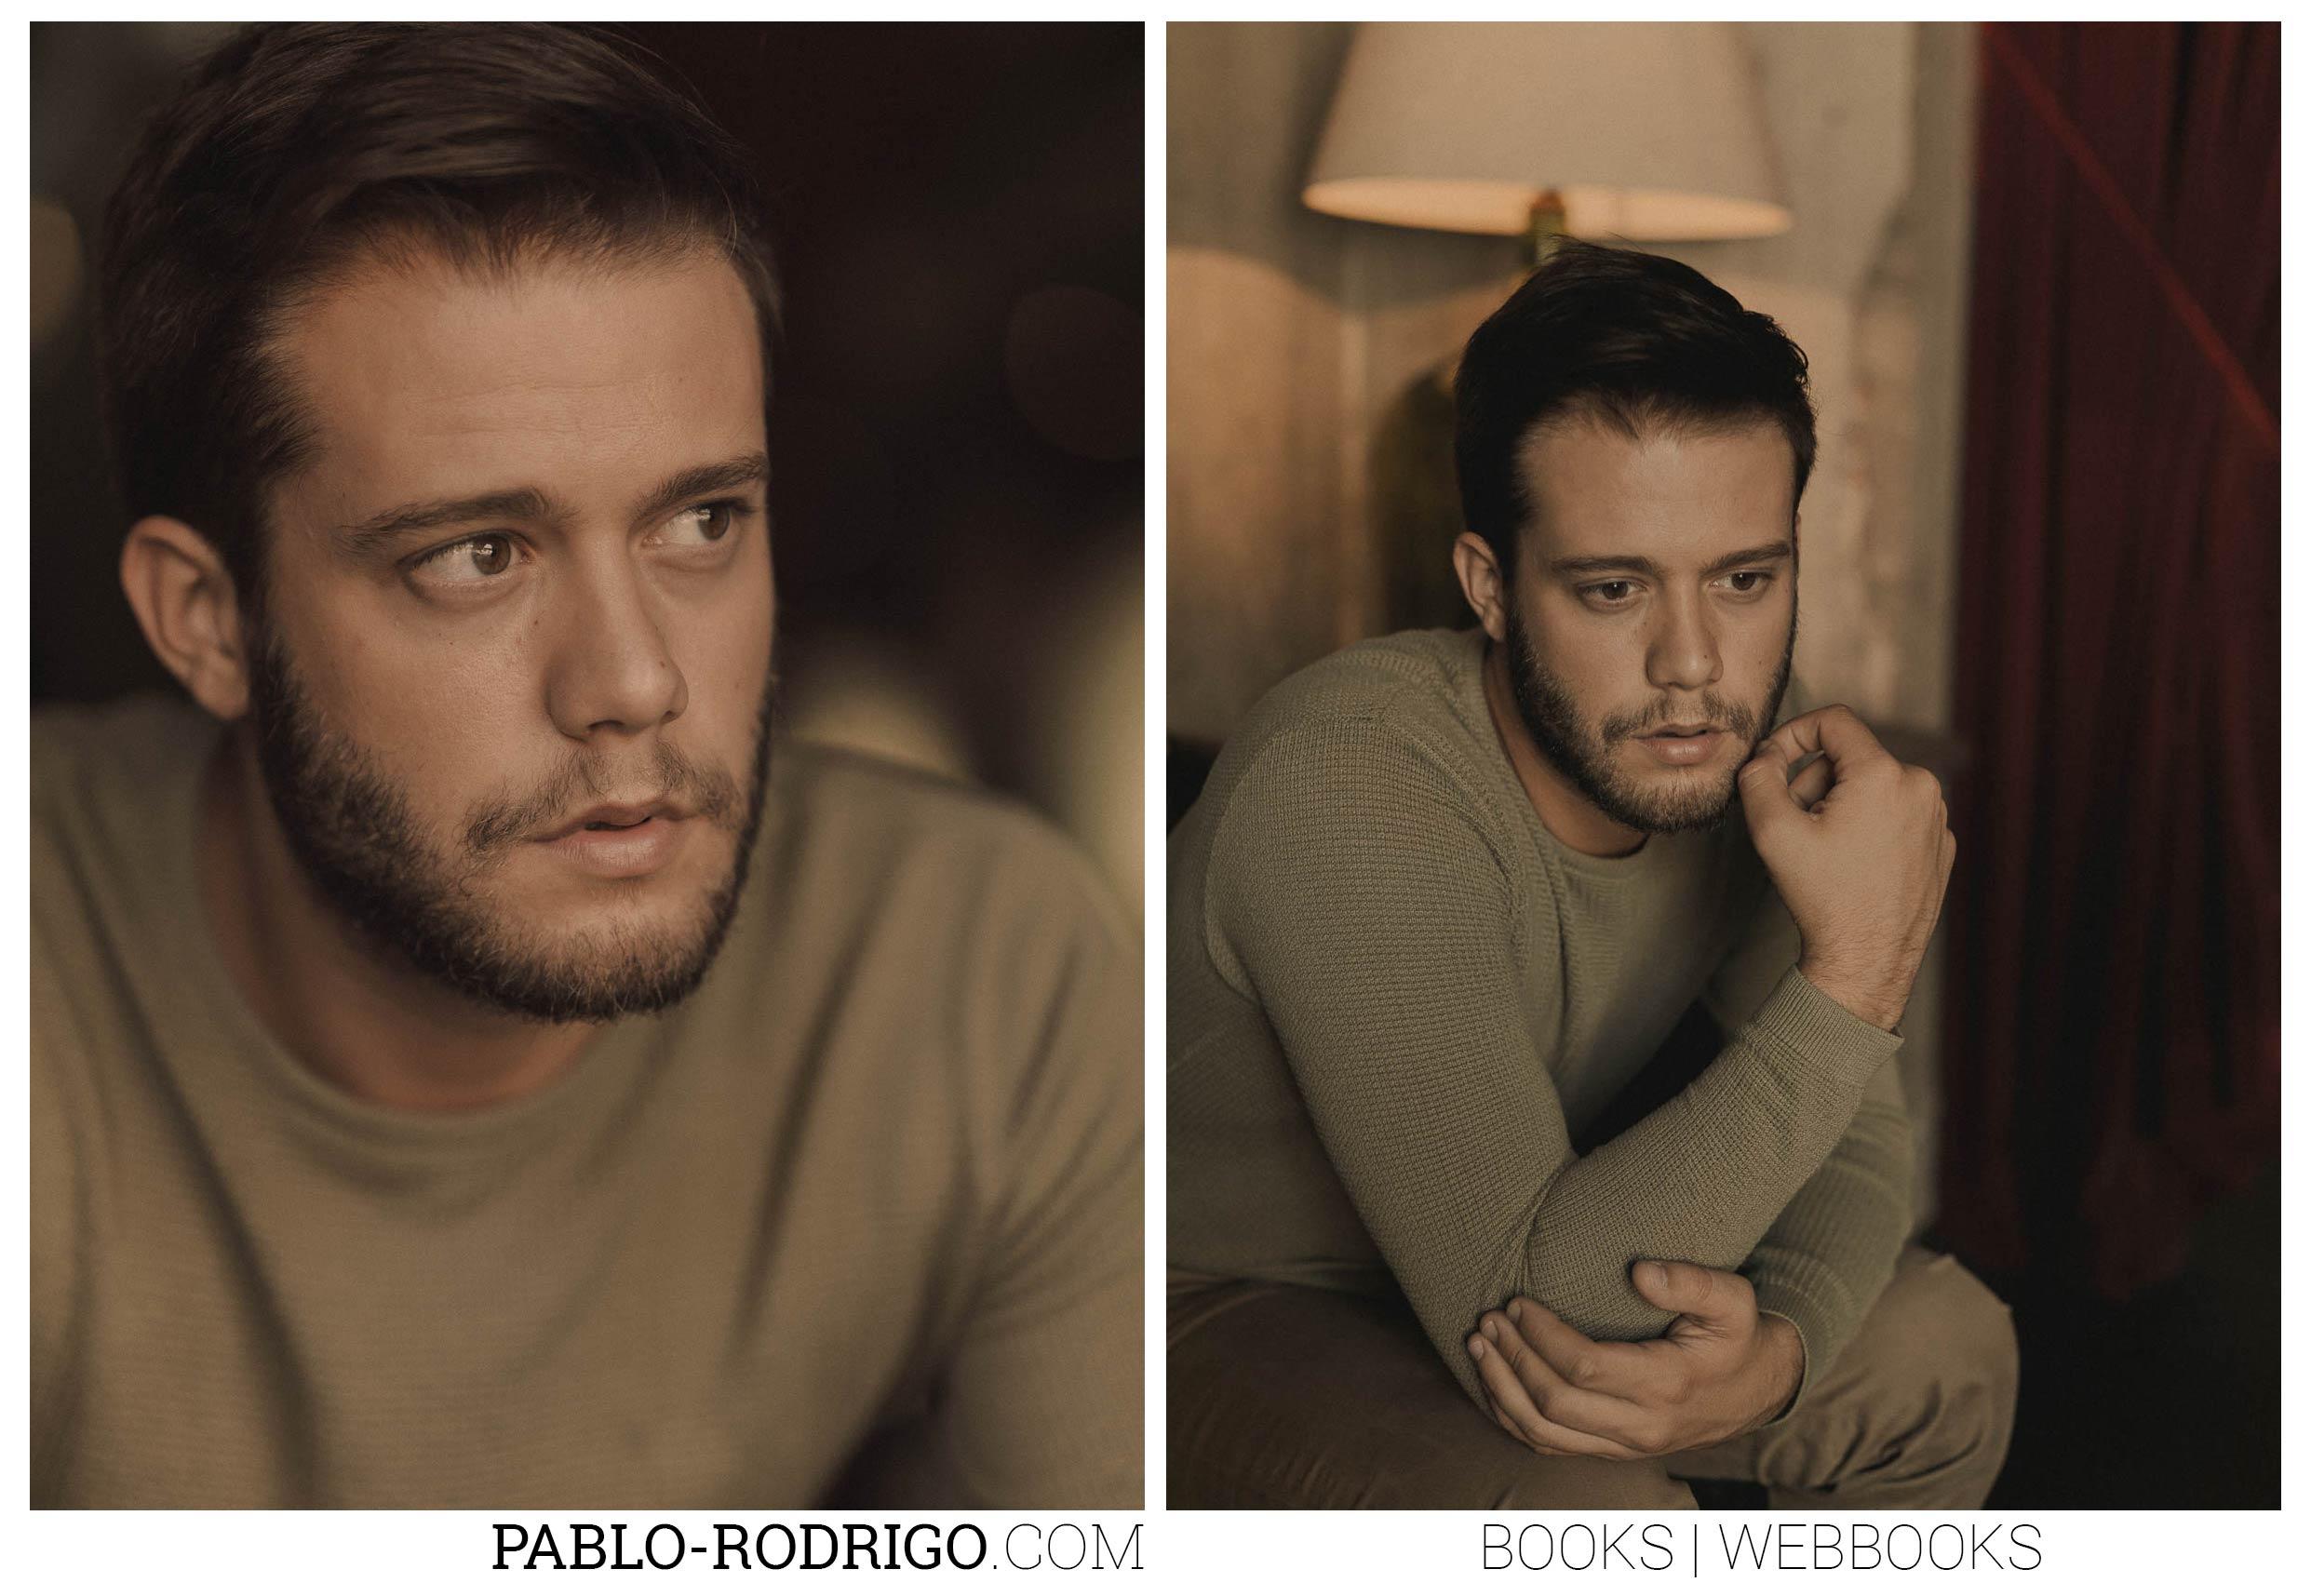 Pablo-Rodrigo-Books-fotografo-madrid-jaime-riba-001.jpg